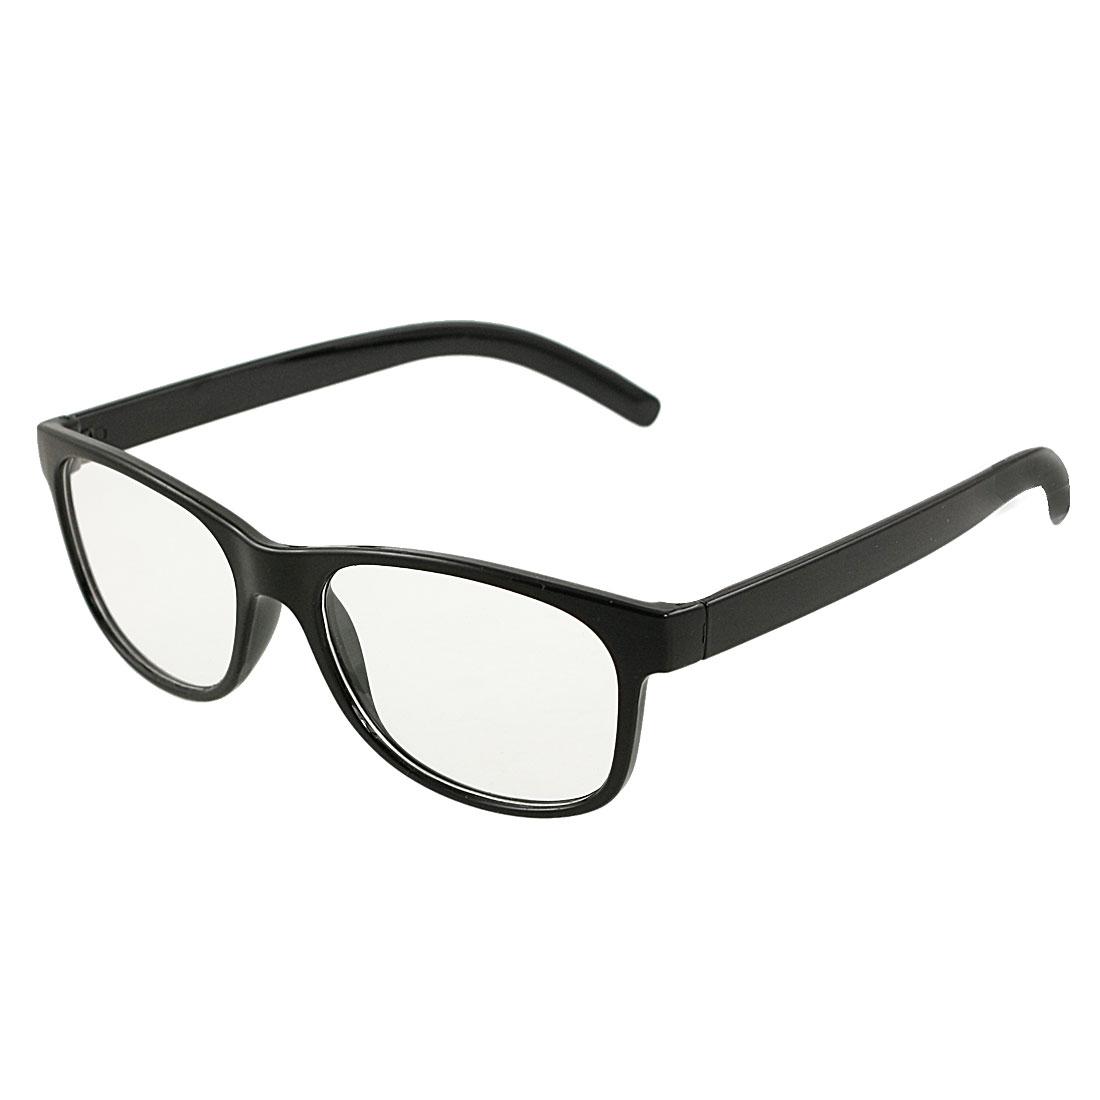 Unisex Single Bridge Black Rectangle Frame Clear Lens Plain Eyewear Glasses